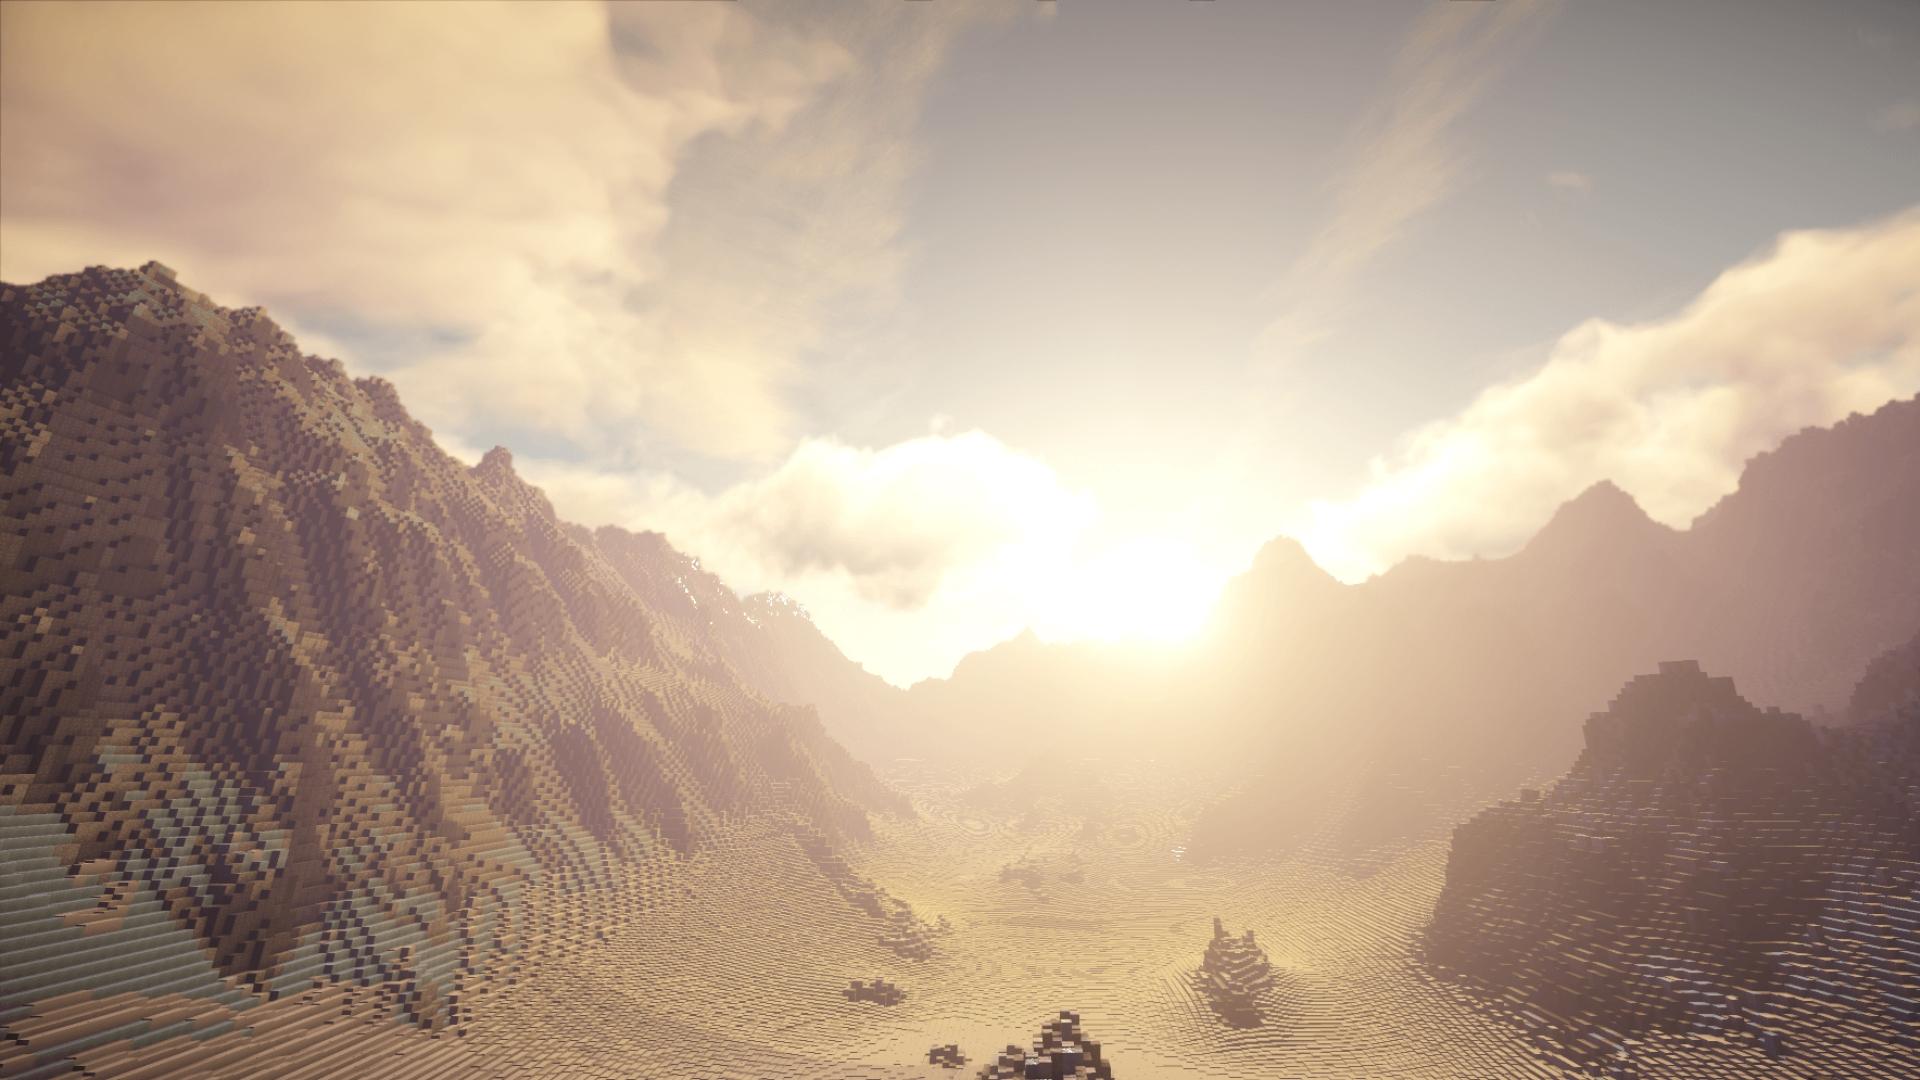 shaders mod ps3 minecraft